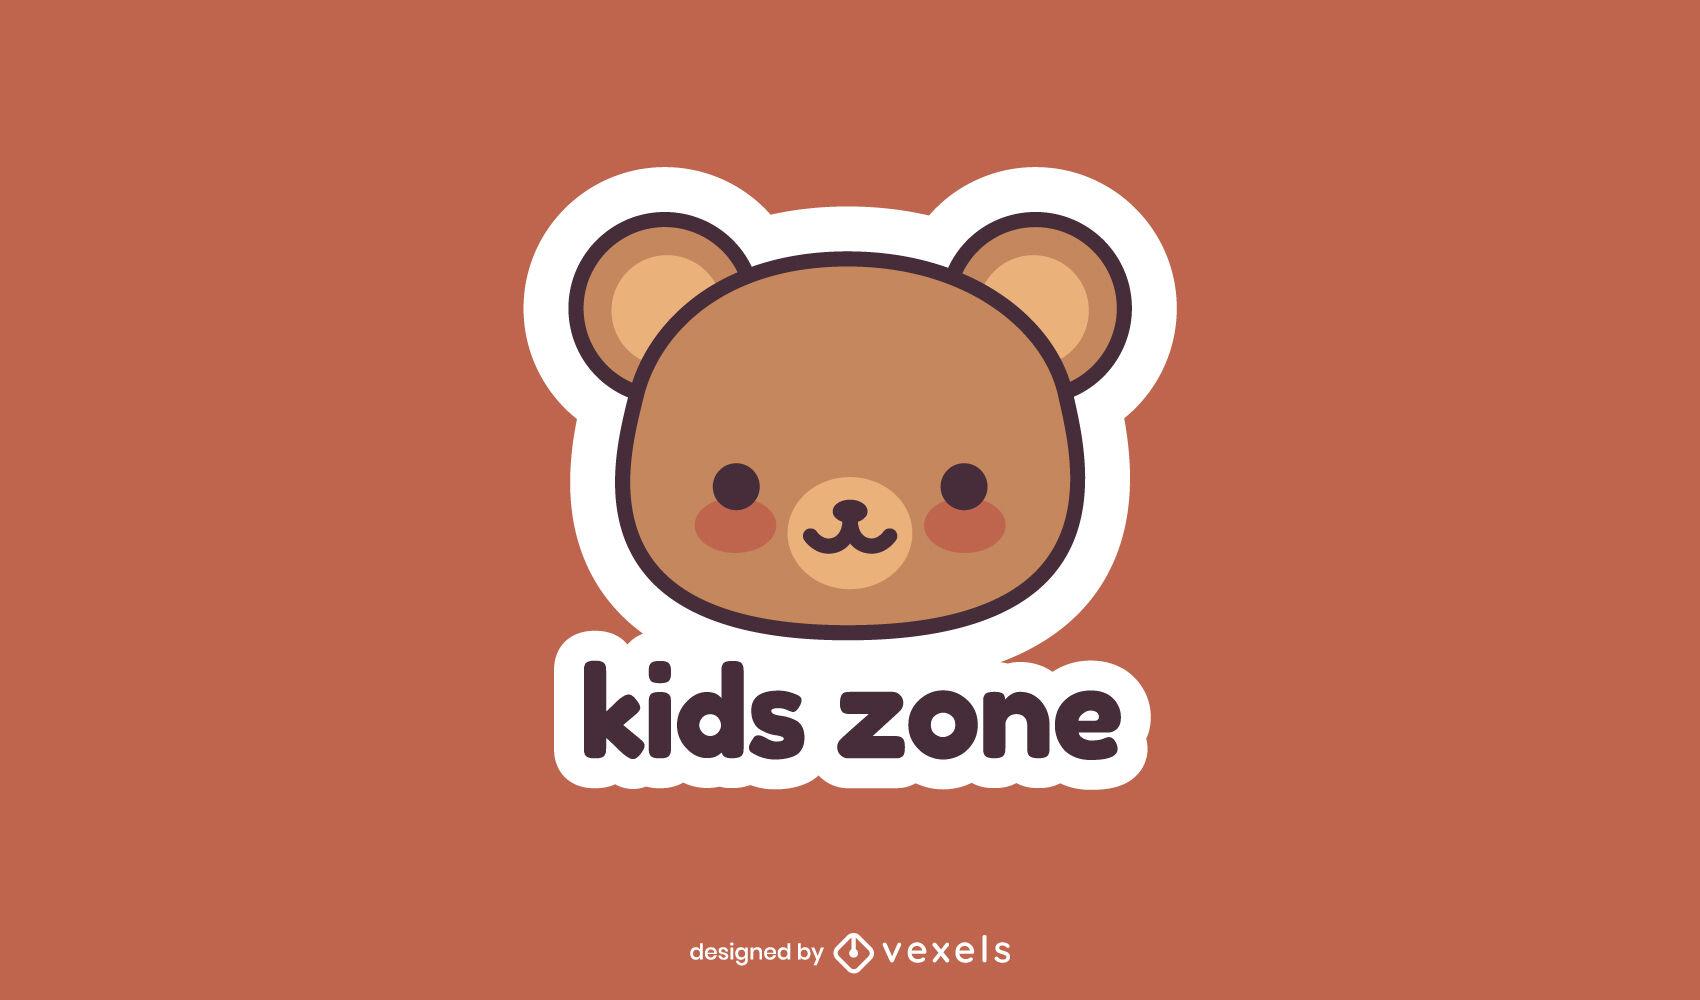 Lindo logo de osito de peluche para niños